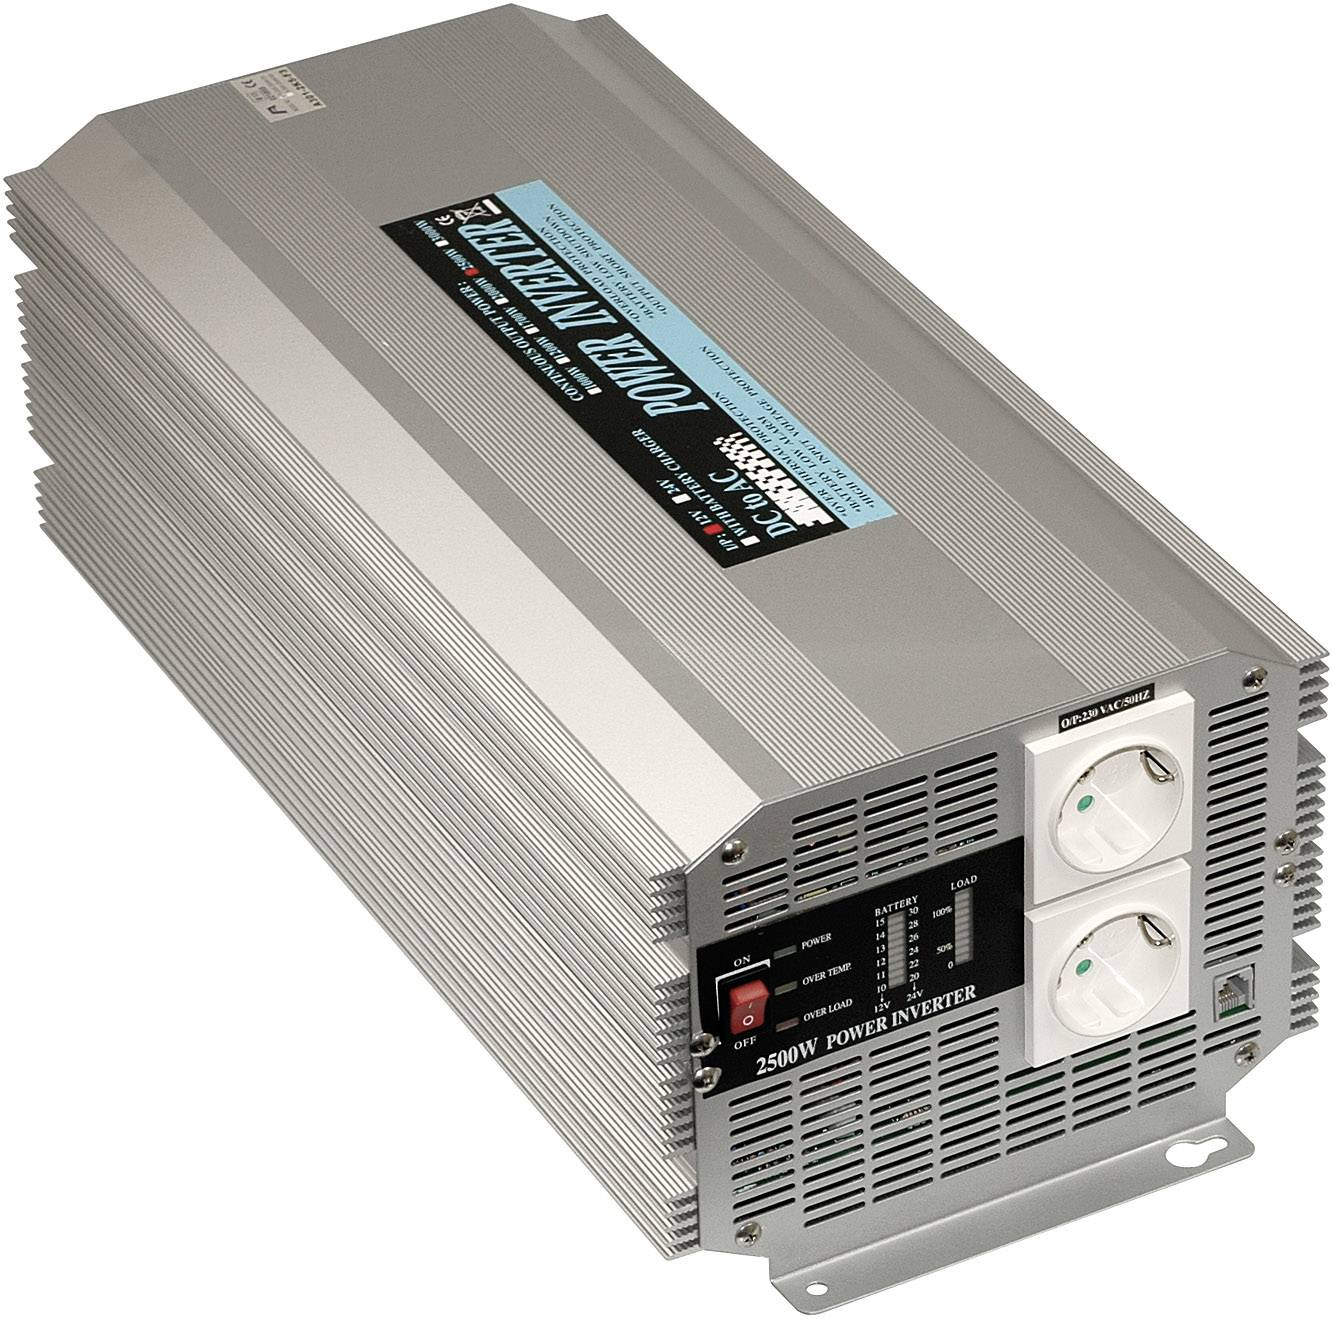 Měnič napětí Mean Well A301-2K5-F3, 2500 W, 12 V/DC/2500 W